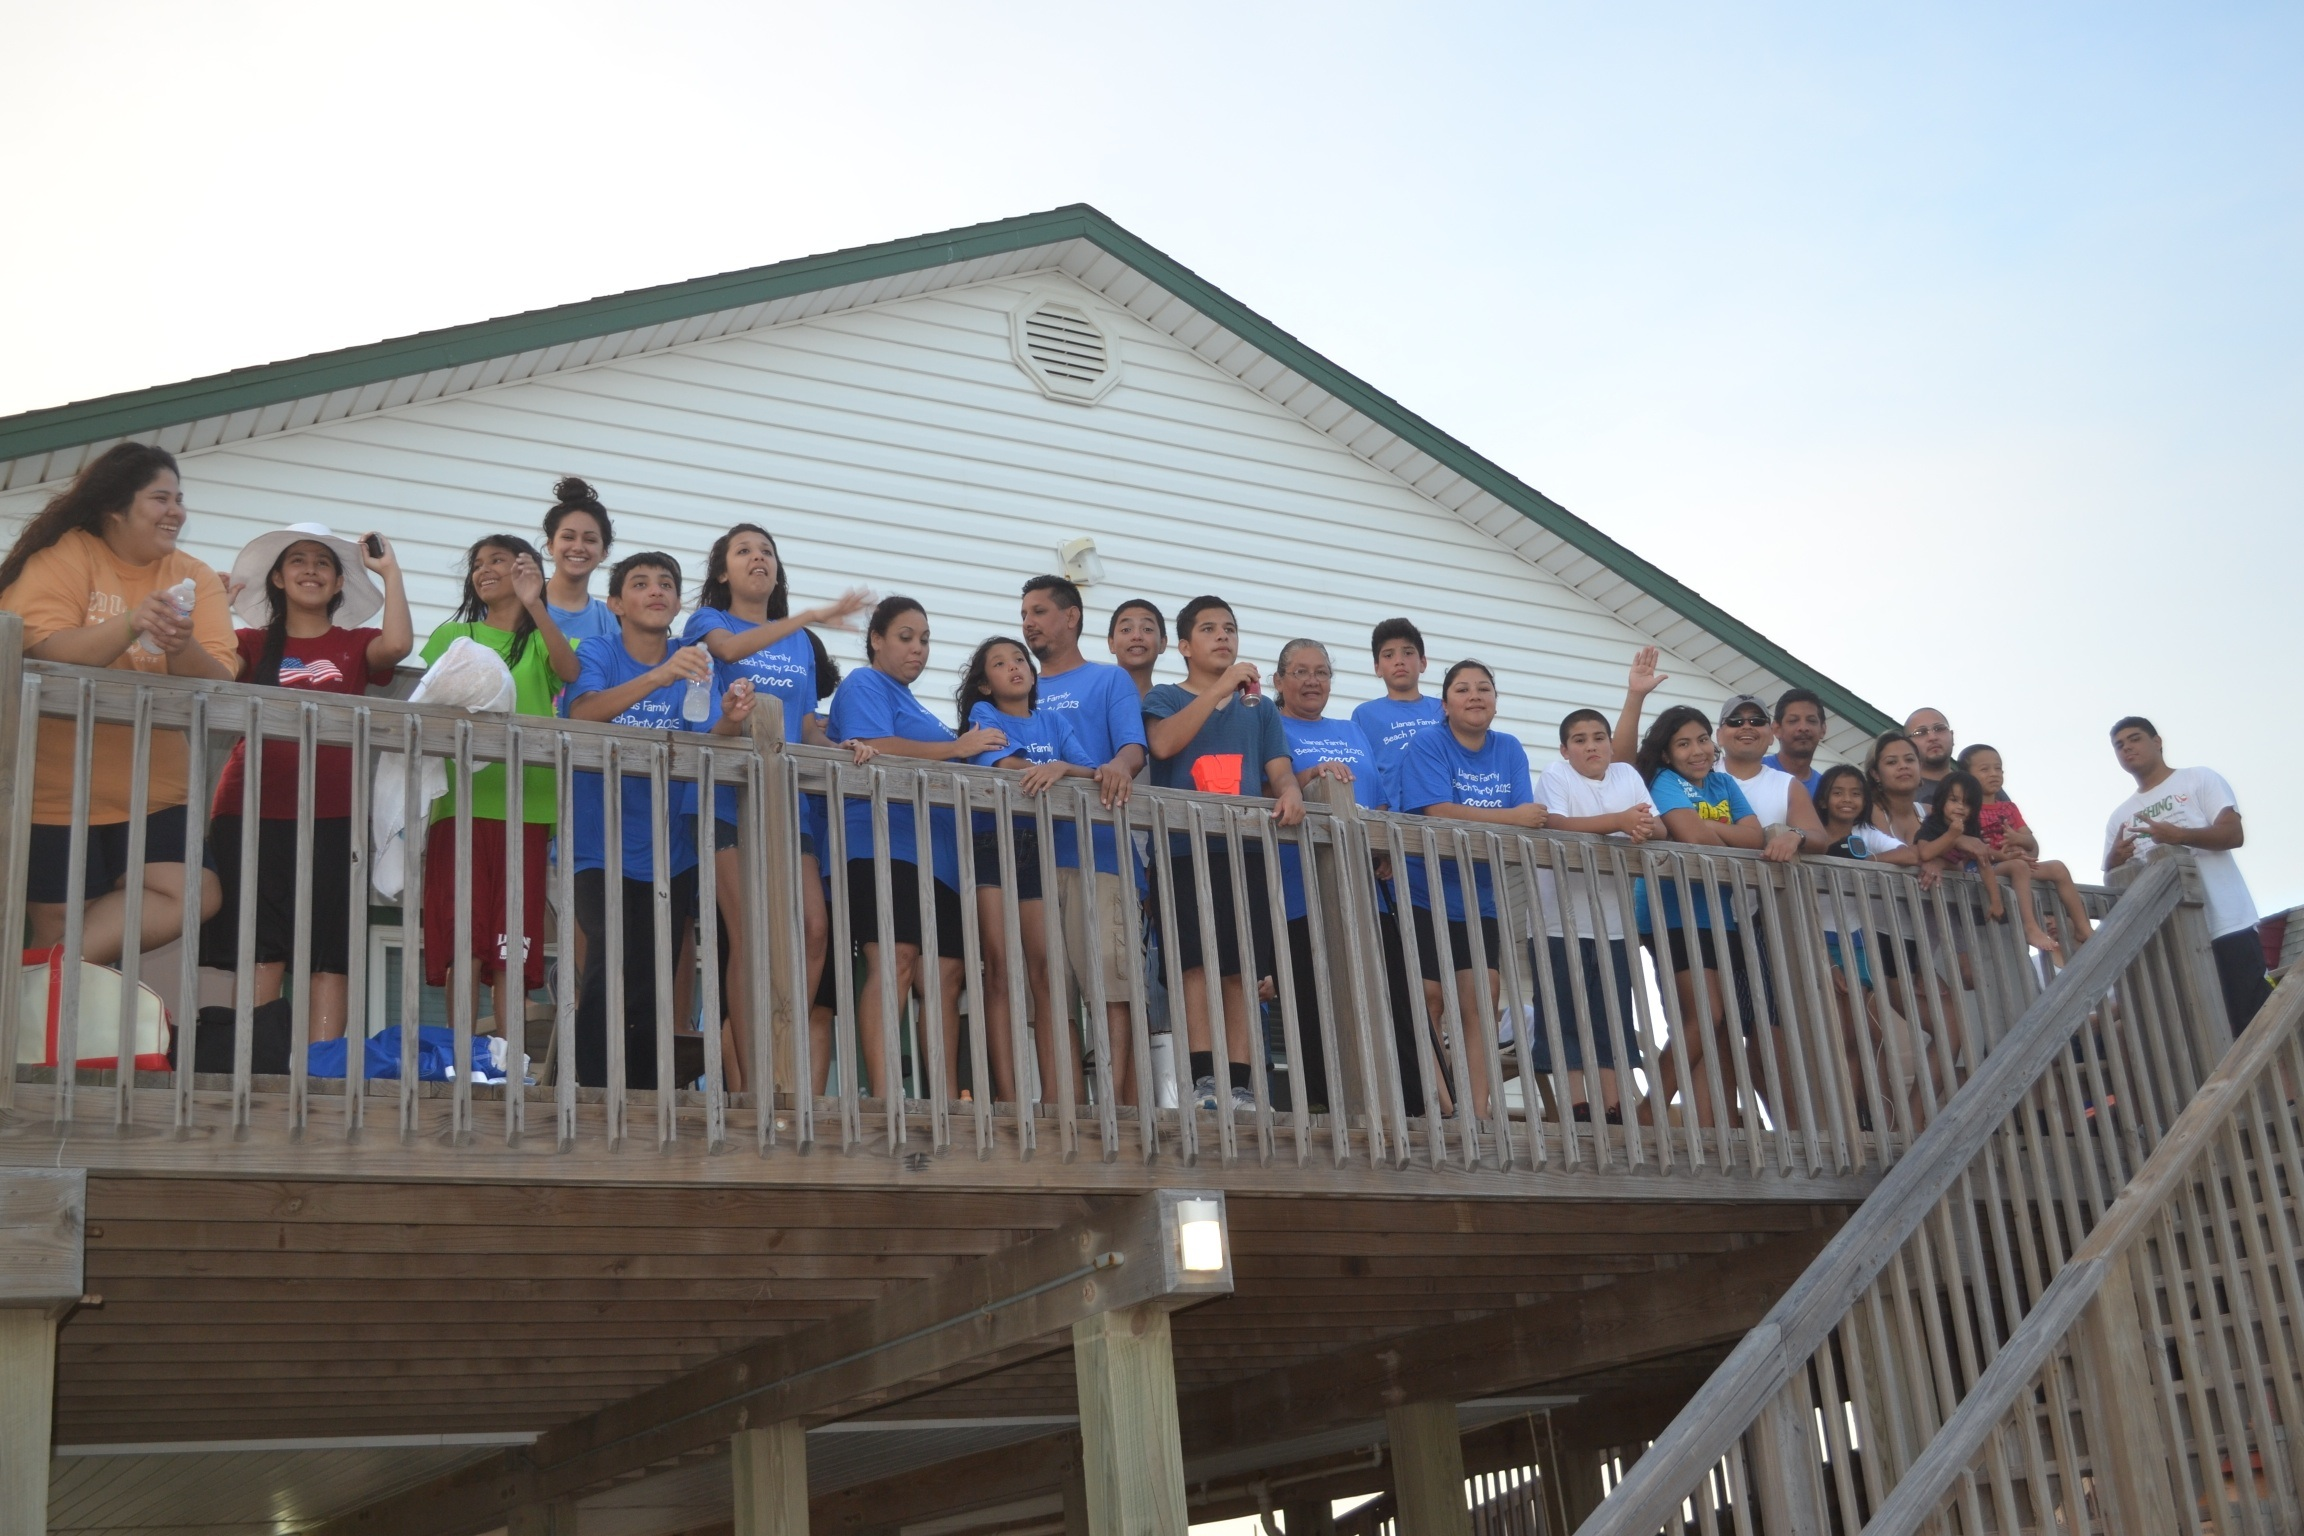 Design t shirt family gathering - Family Gathering At The Beach T Shirt Photo